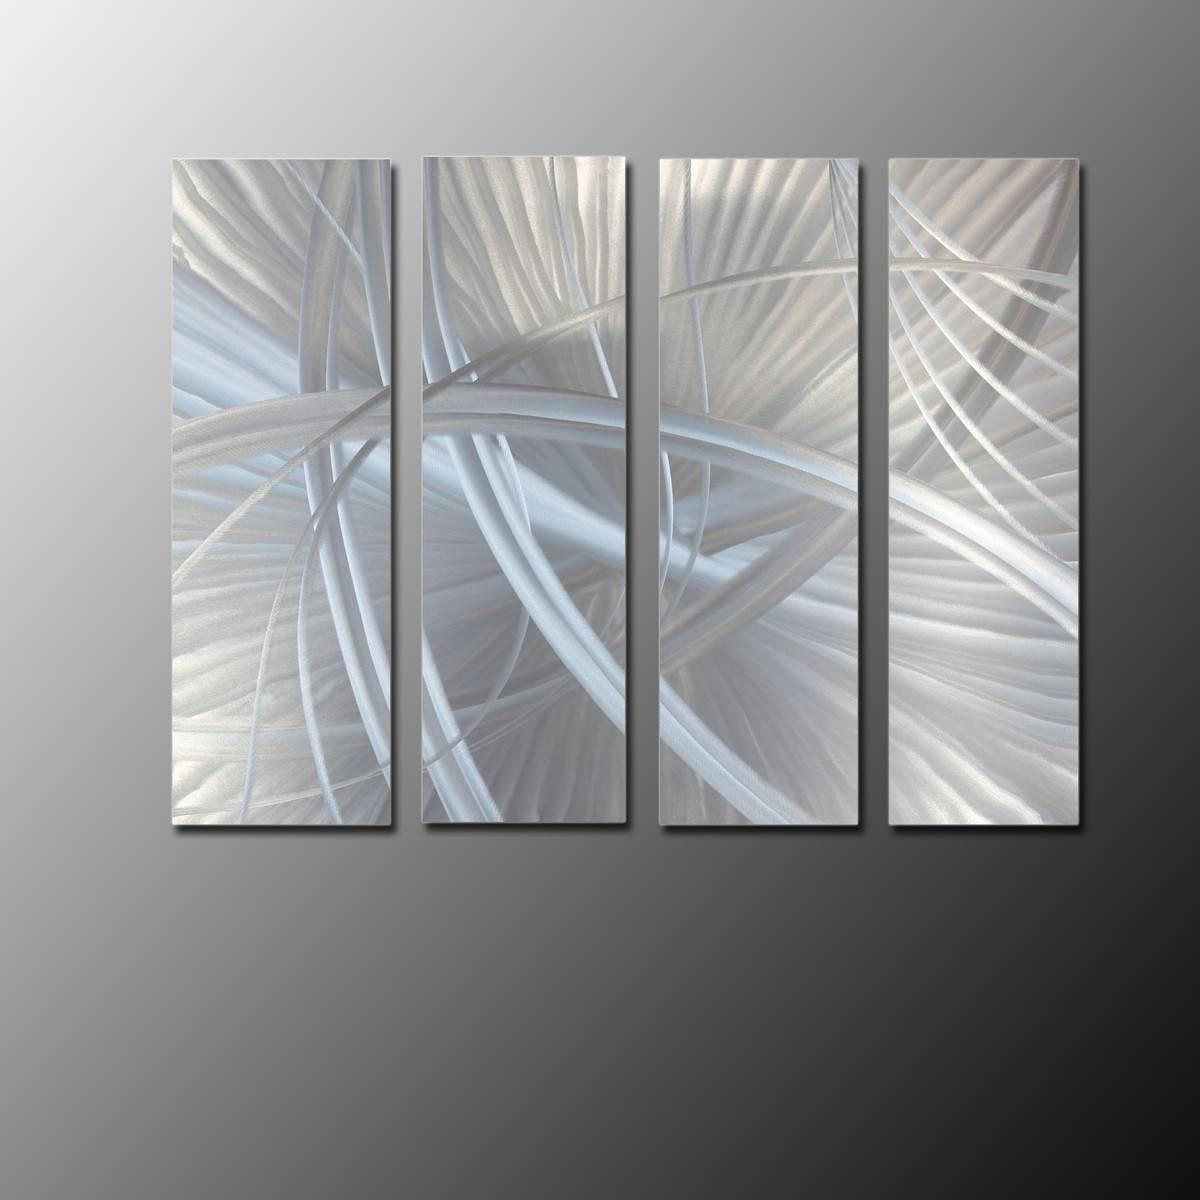 Decor : Best Decorative Metal Wall Art Panels Excellent Home For Recent Metal Wall Art Panels (View 15 of 20)